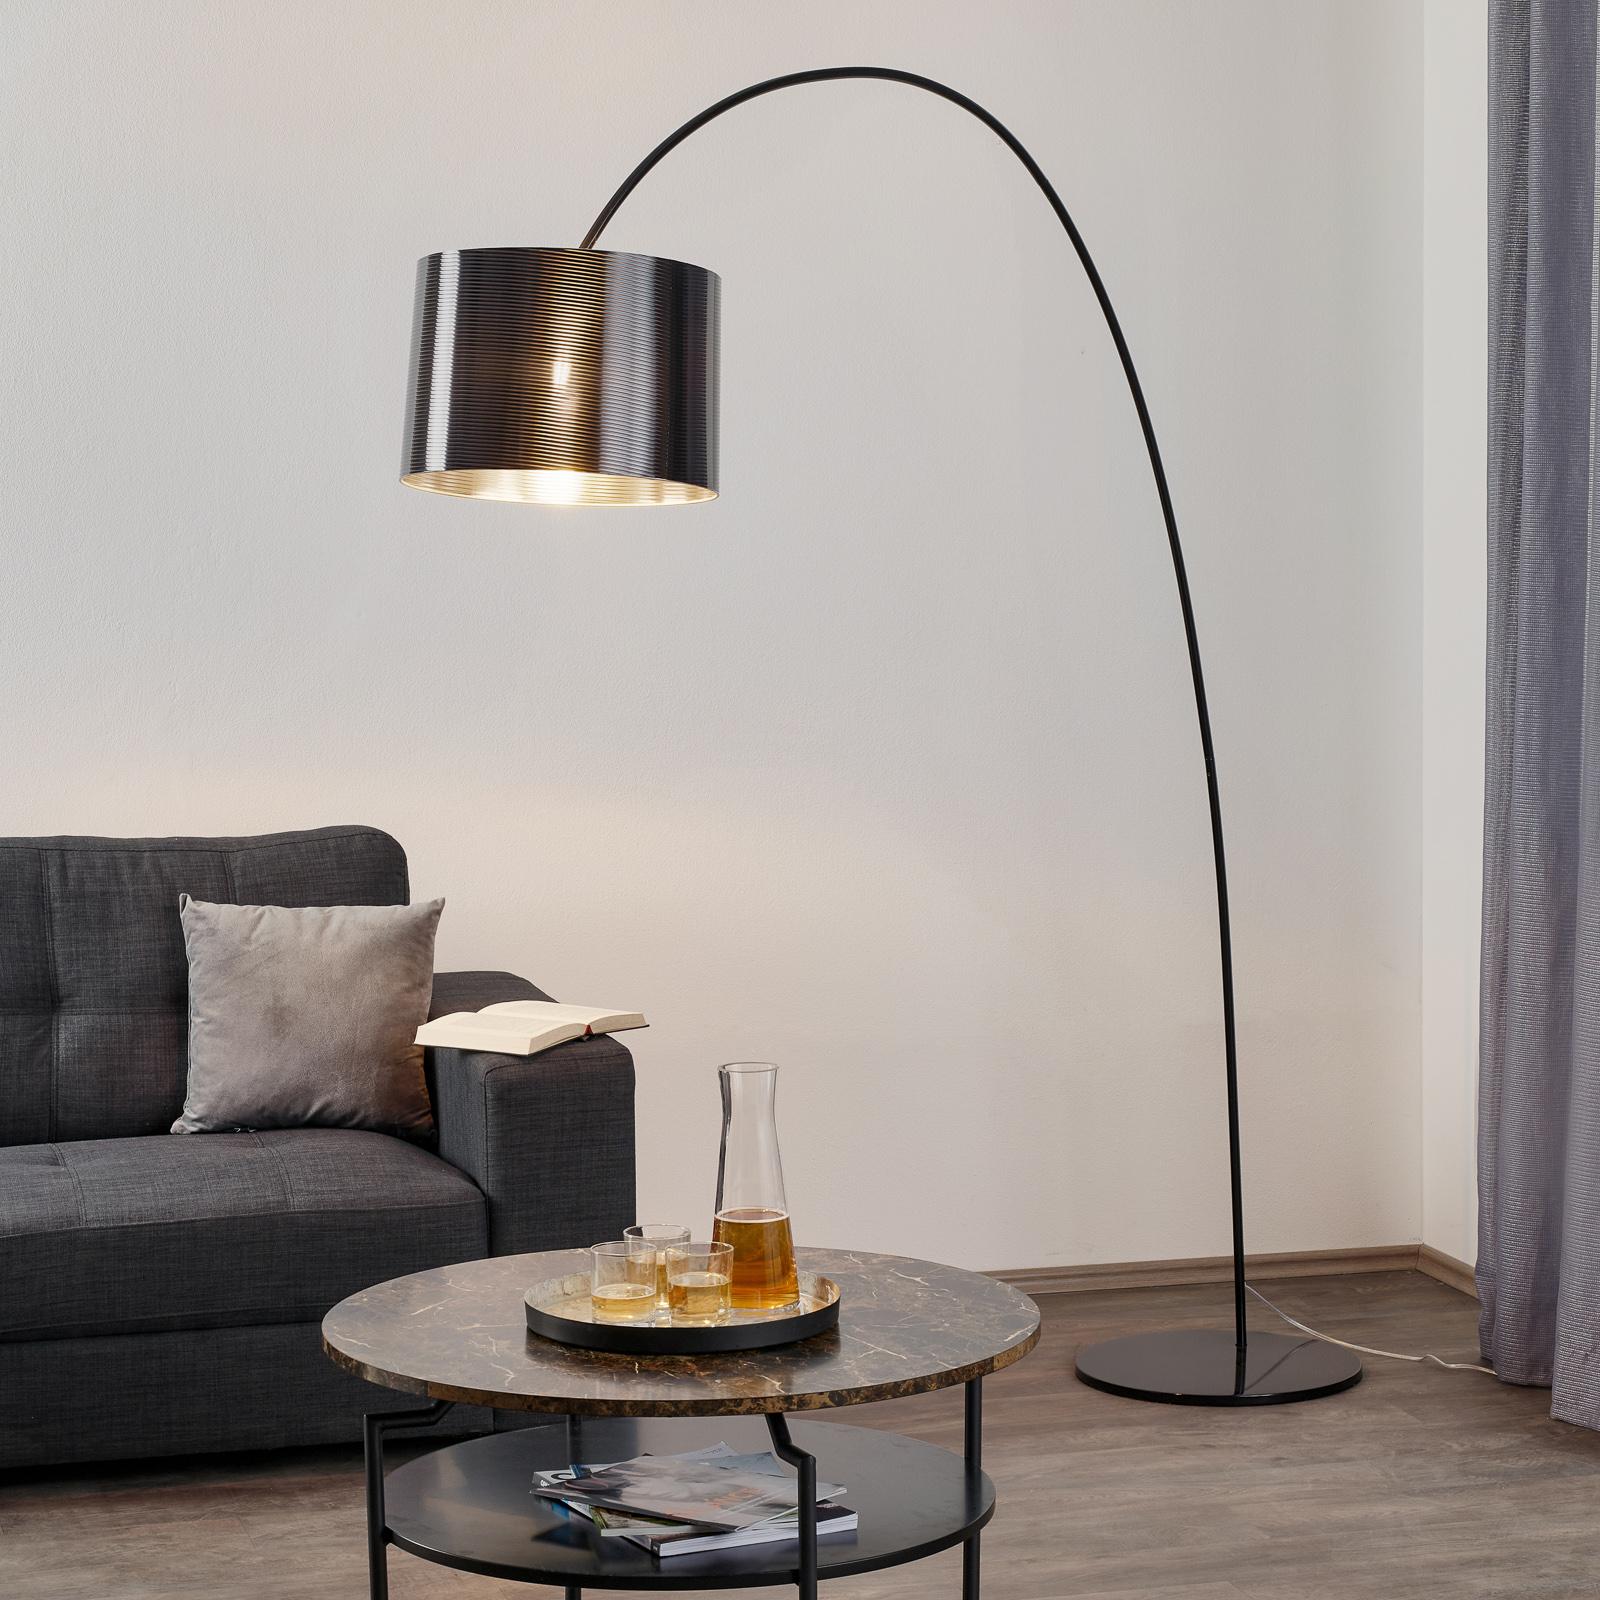 Helestra booglamp Roxx, zwart